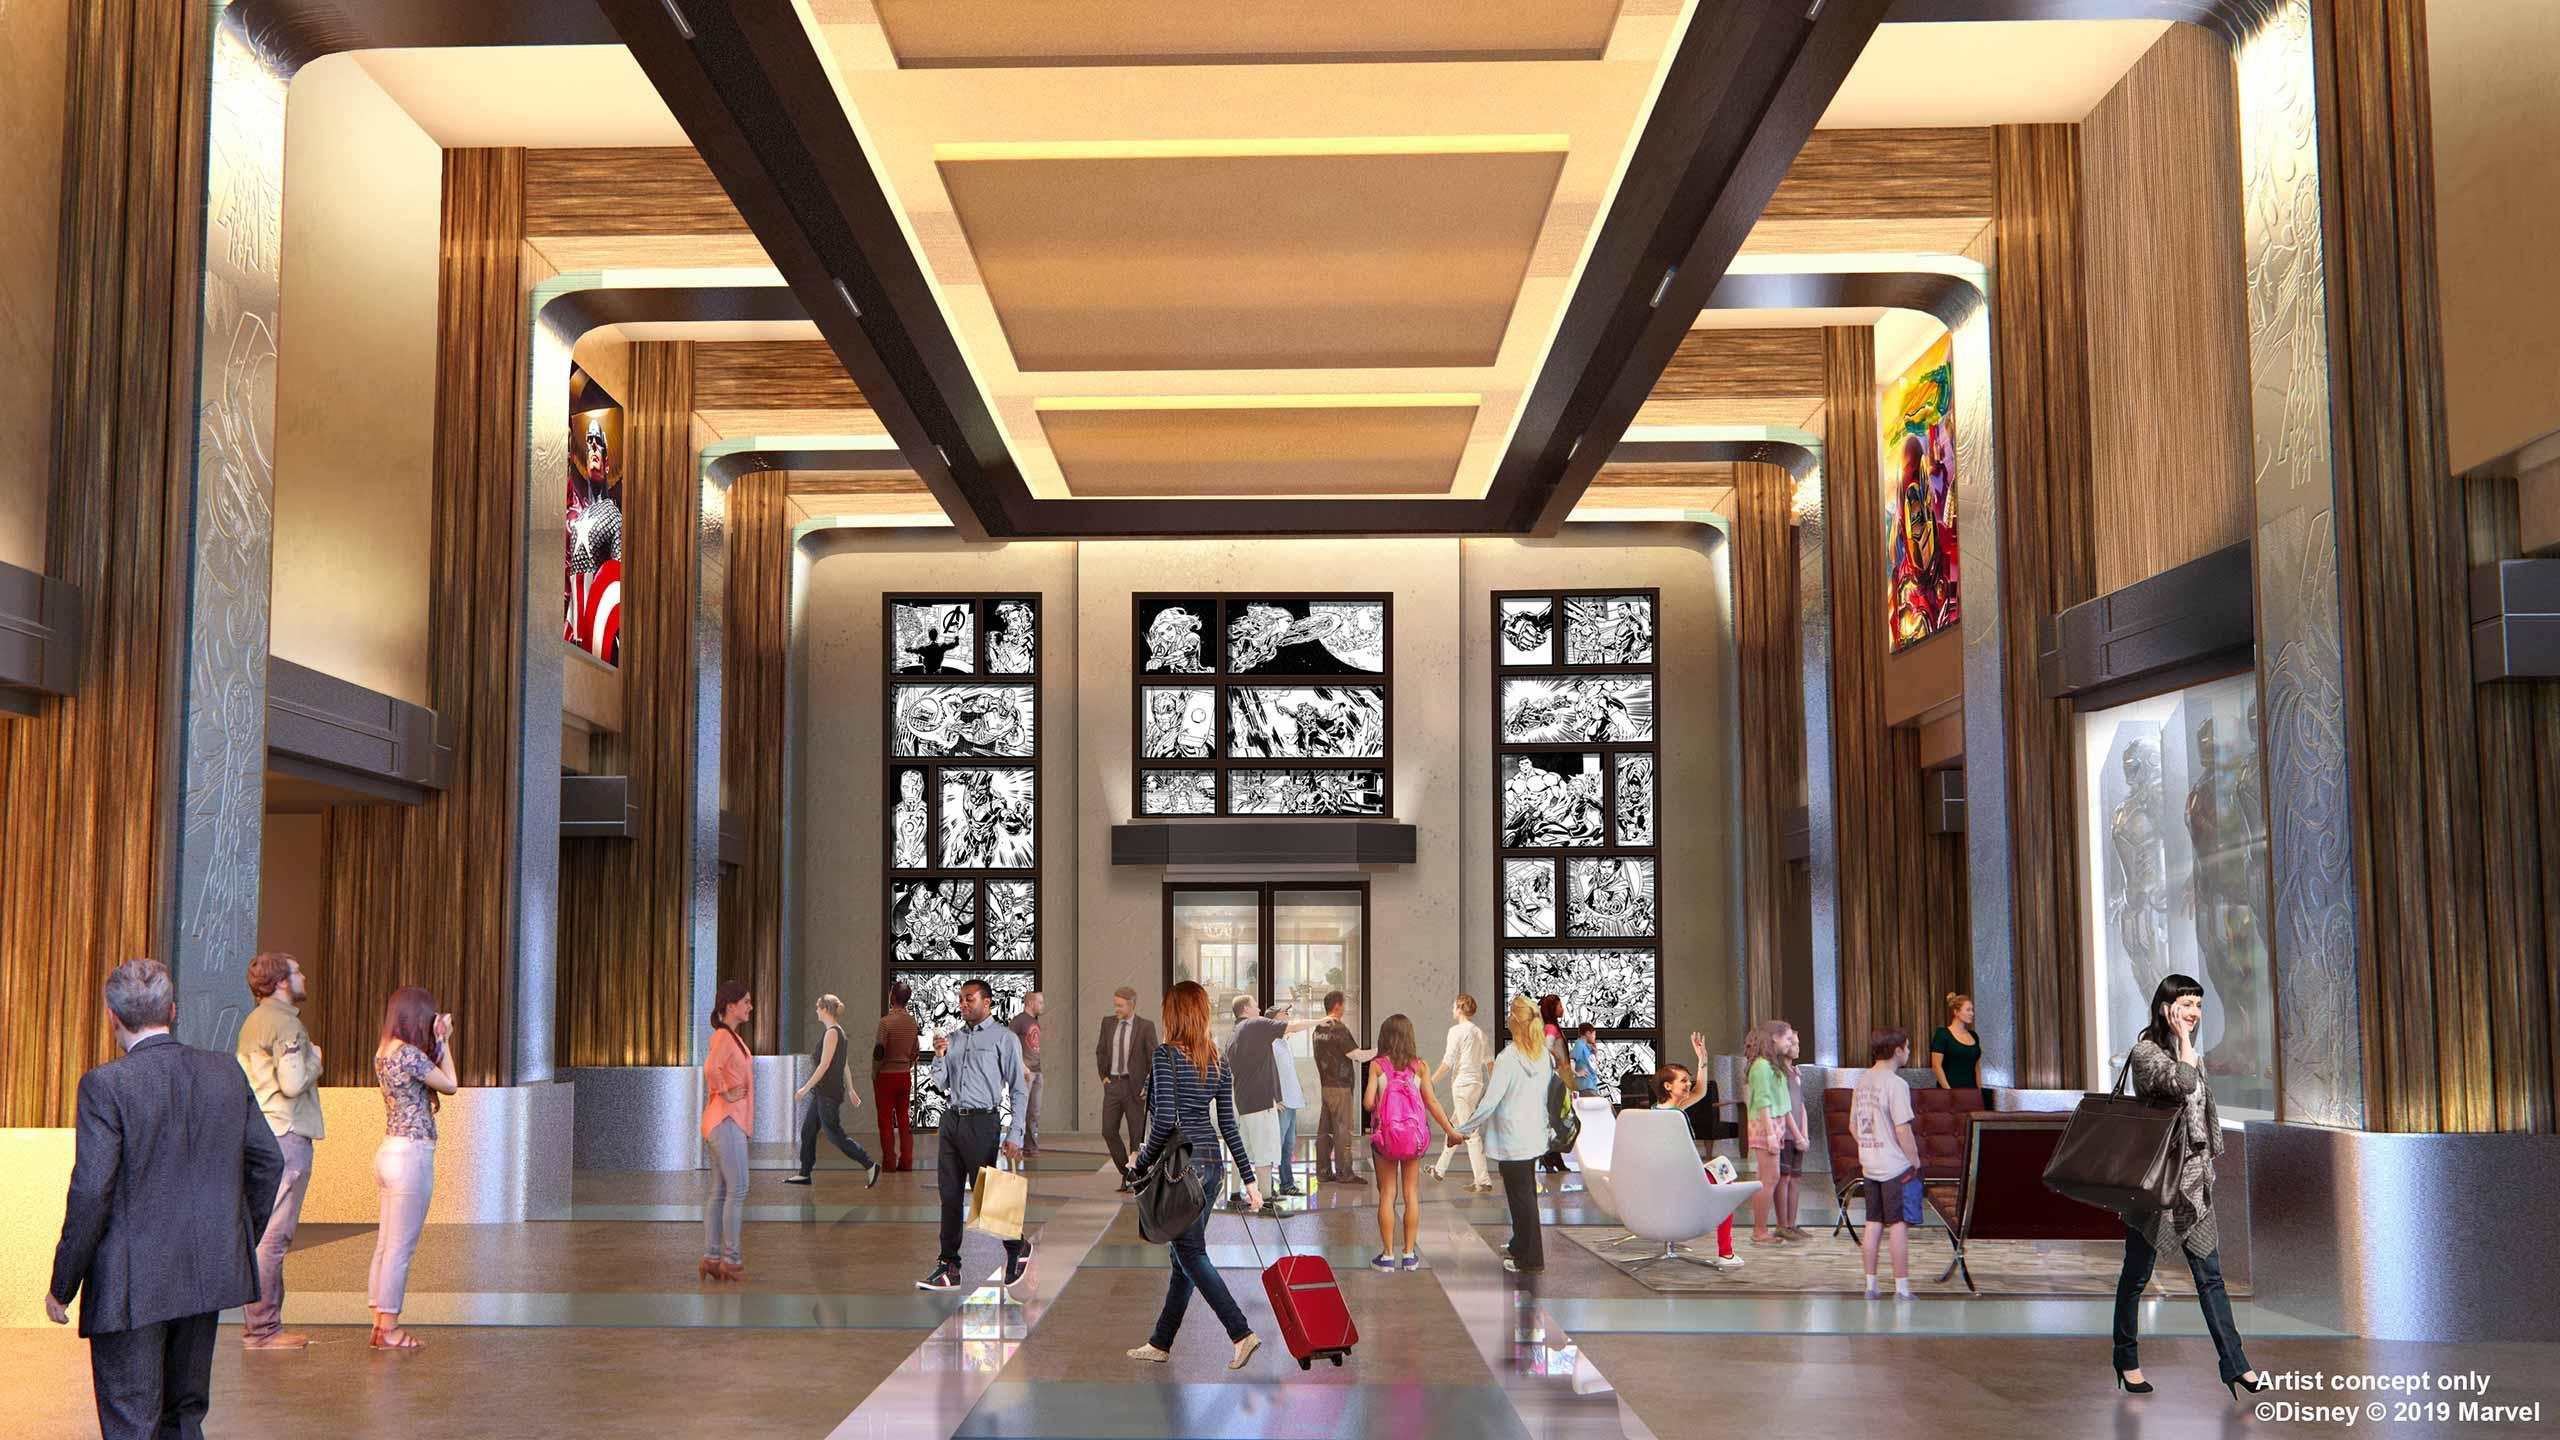 Nieuwe Disney's Hotel New York – The Art of Marvel in Disneyland Paris